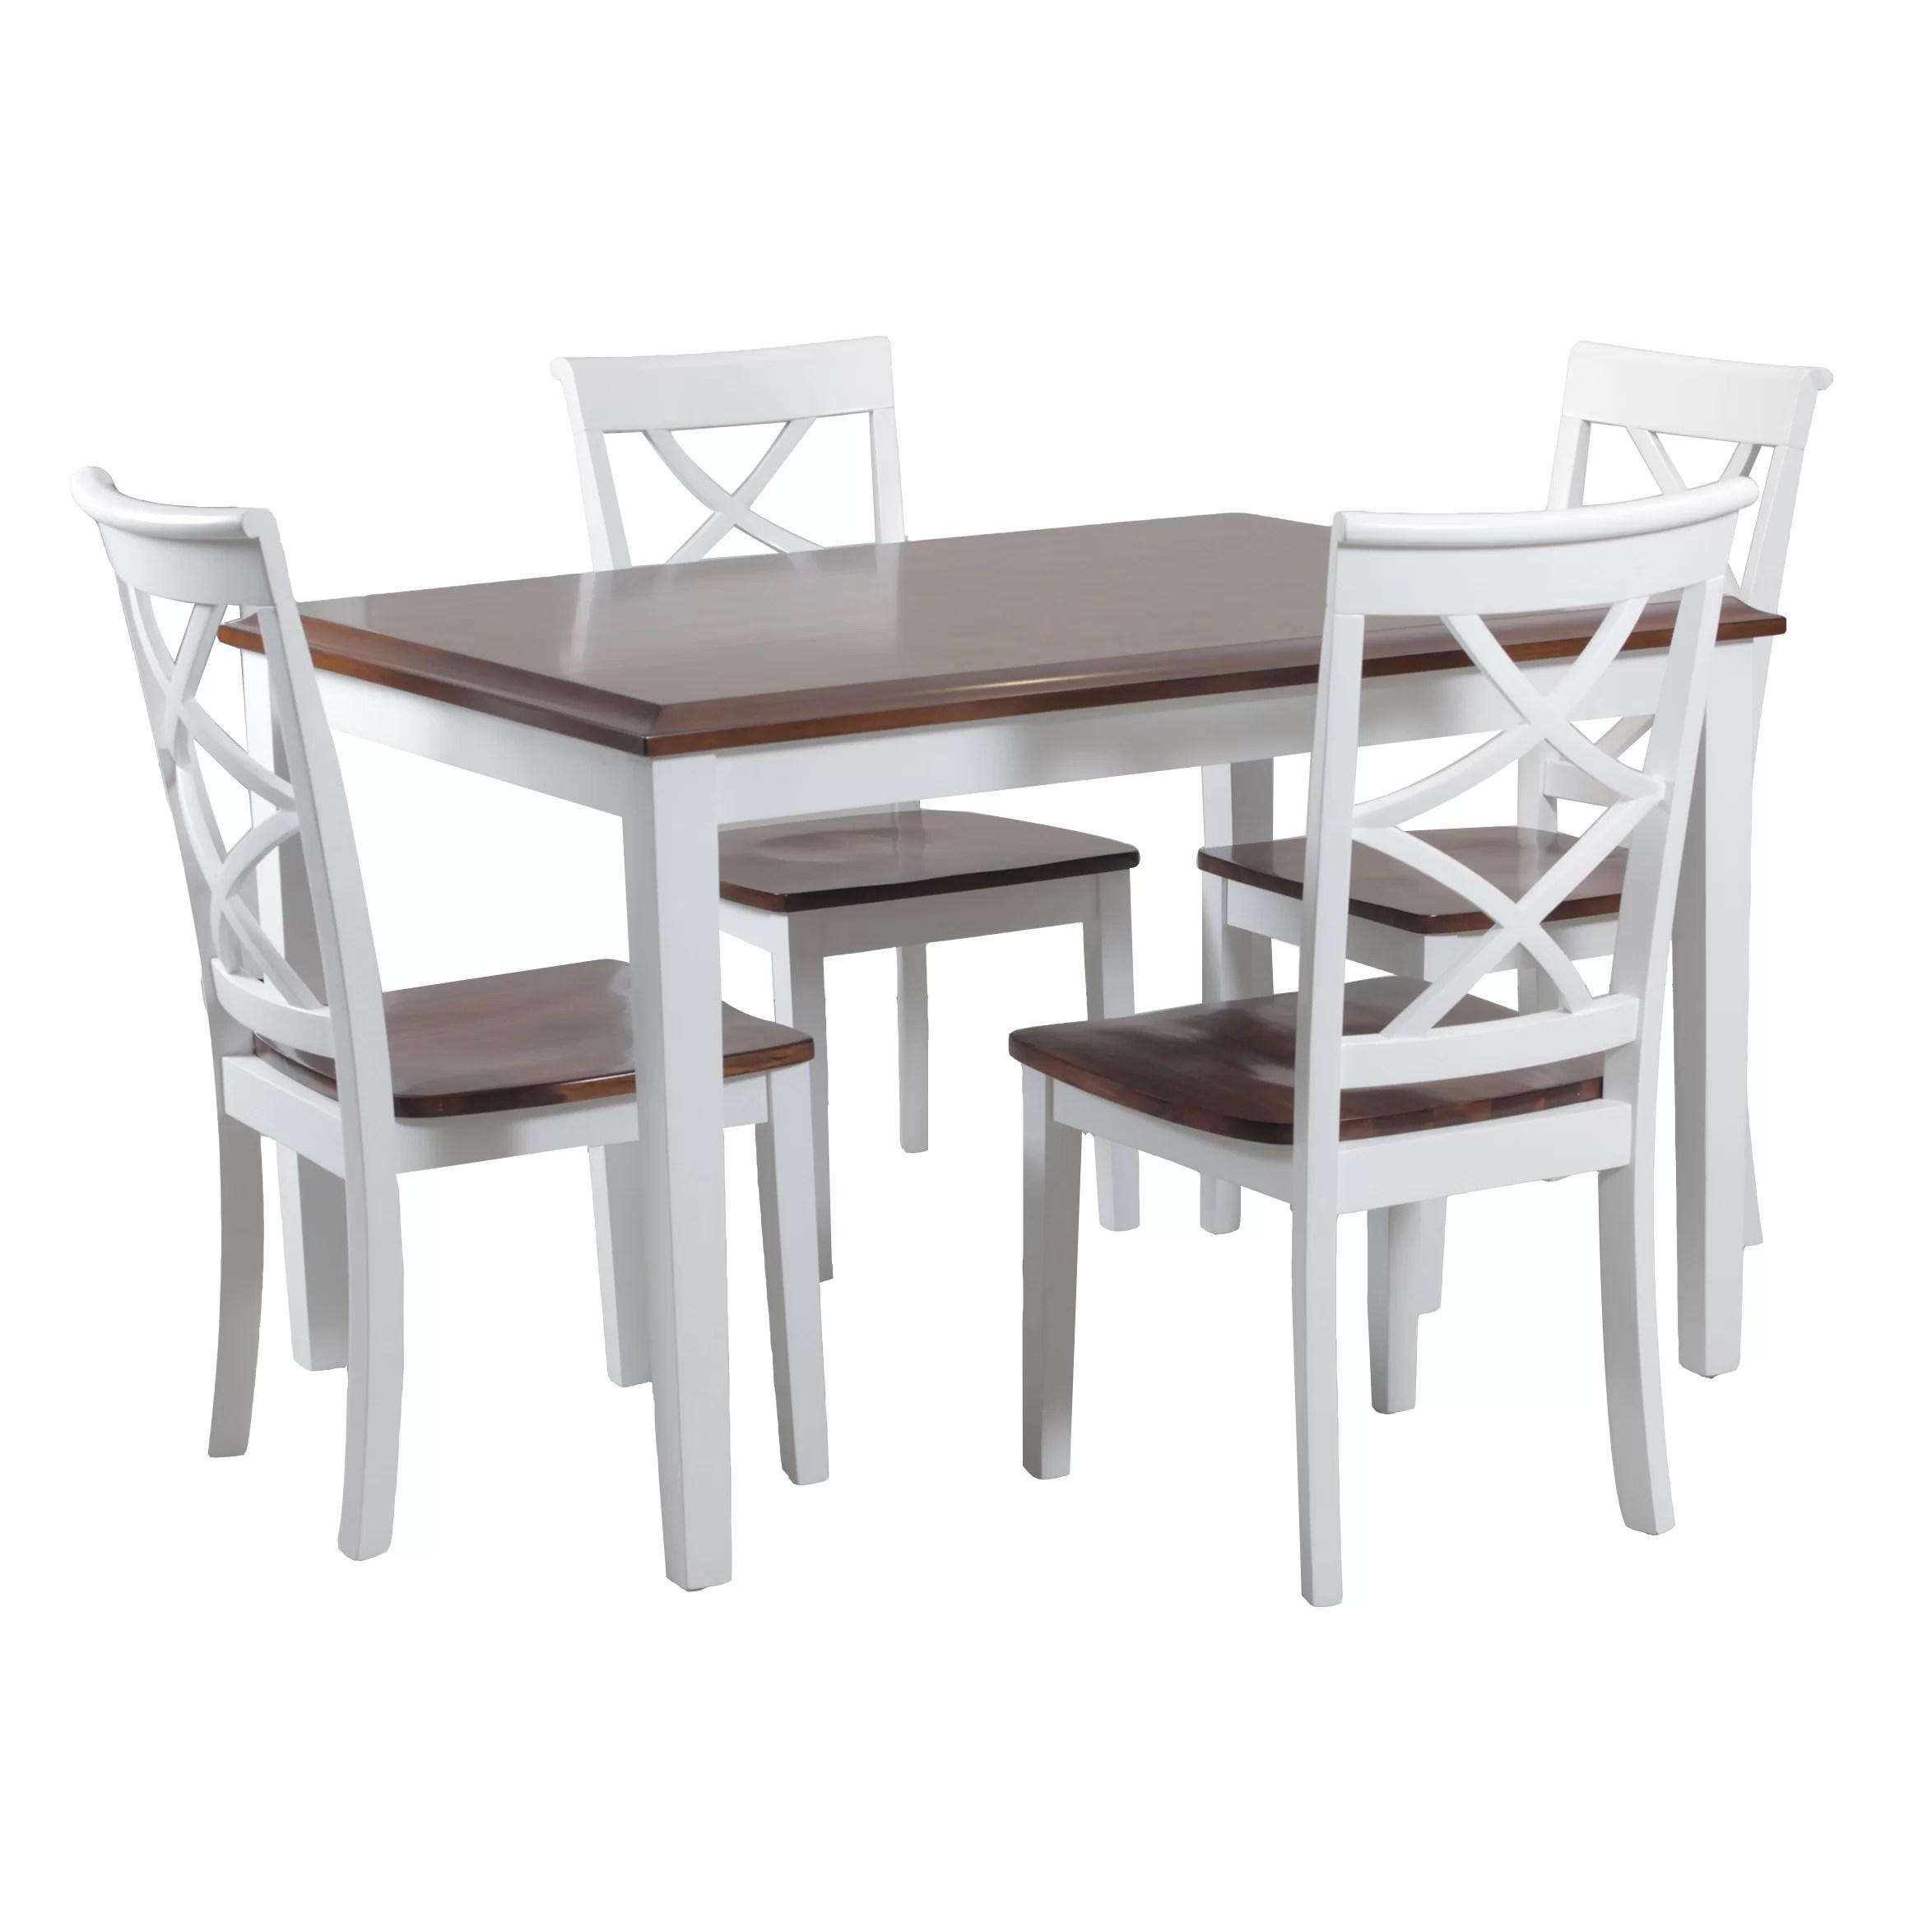 ^ Juno 5 Pc ound Dining Set. kitchen dinnerware set cookware mug ...